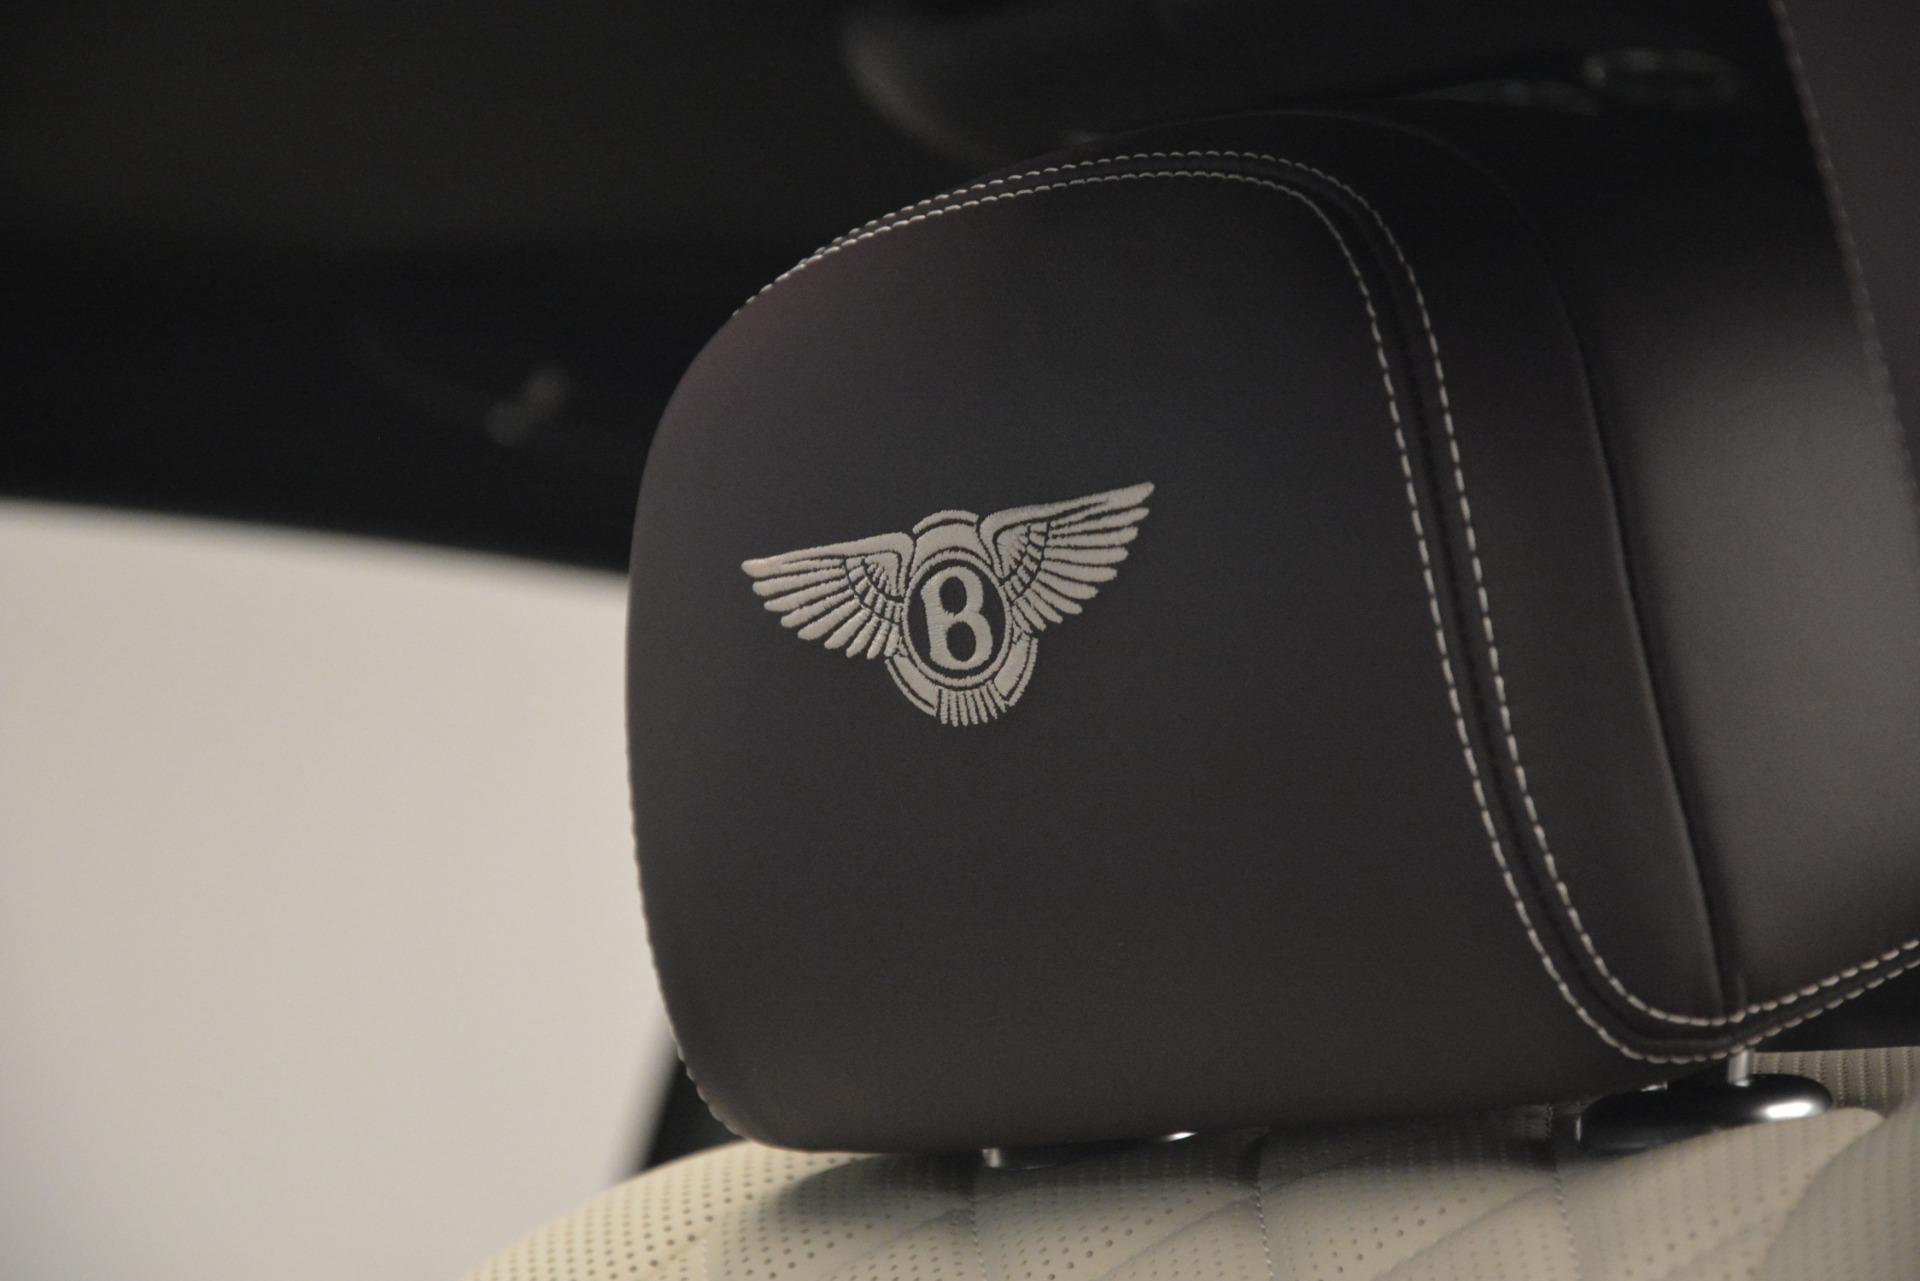 Used 2018 Bentley Flying Spur W12 S For Sale In Westport, CT 2973_p22